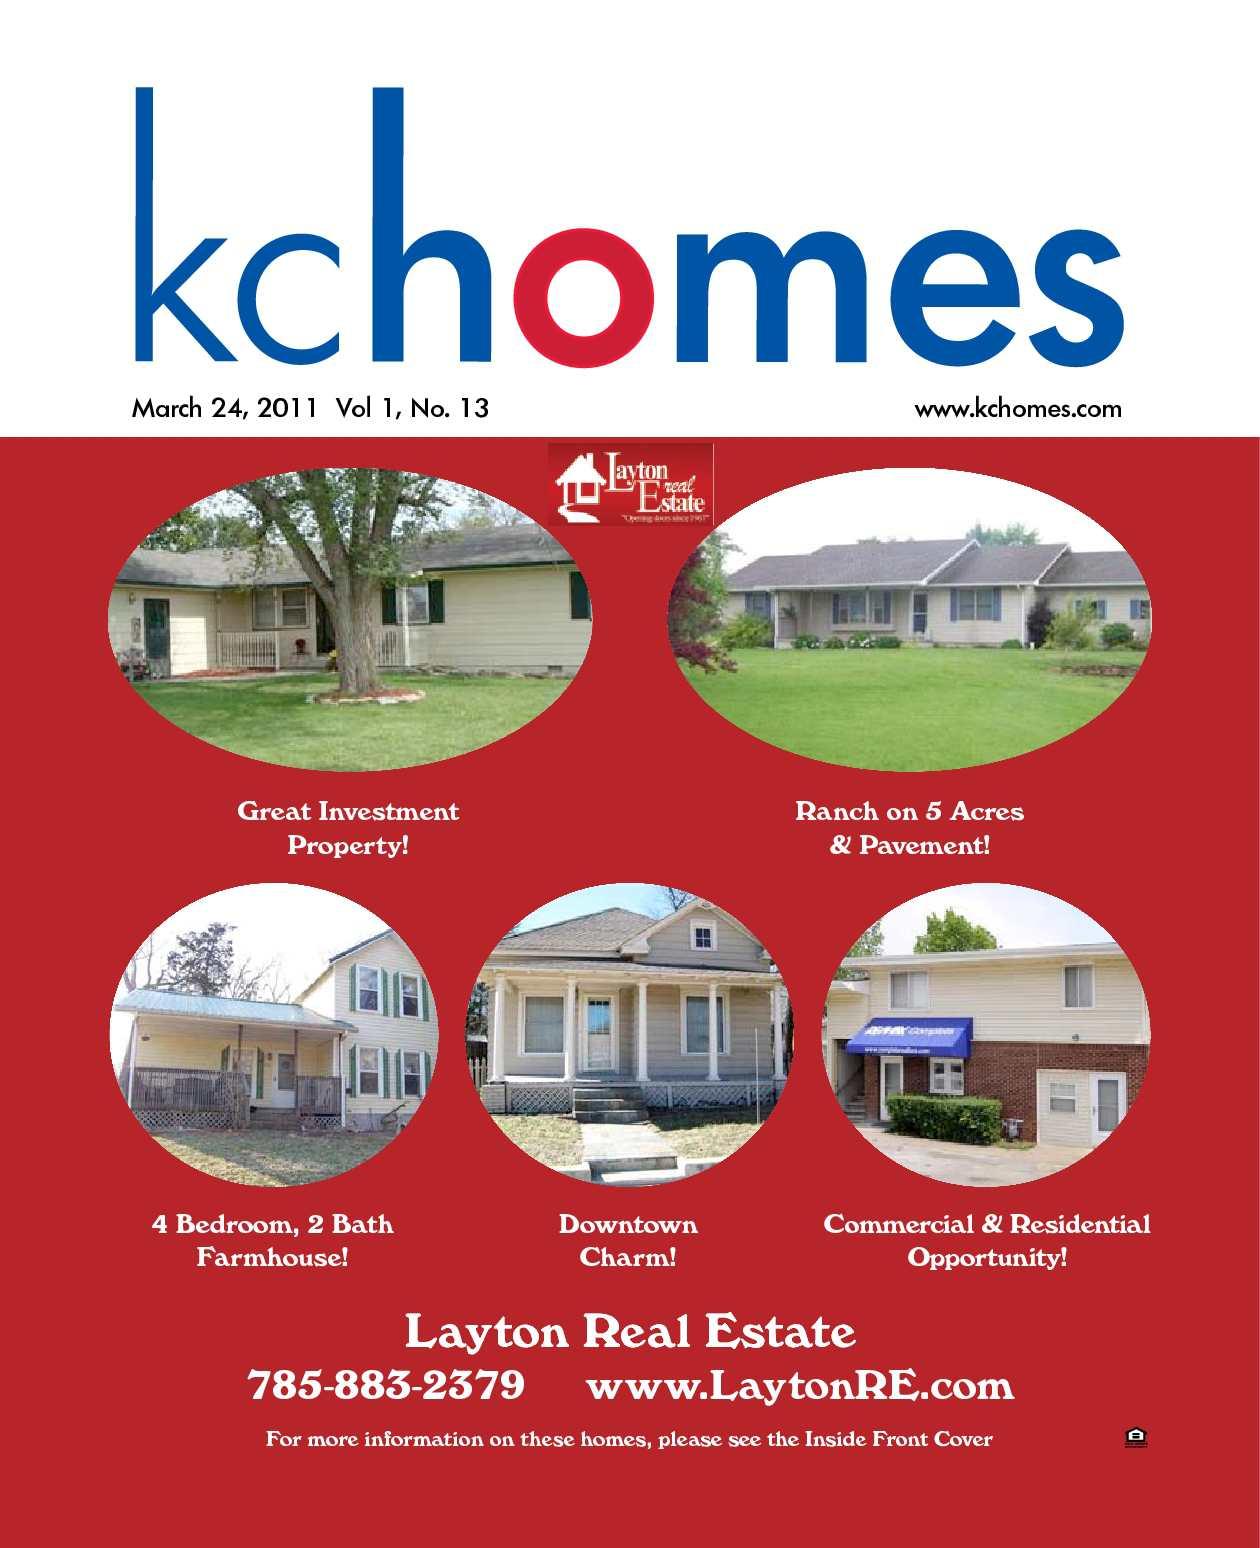 Calaméo - Kansas City Homes  March 24, 2011 8059a8af5690